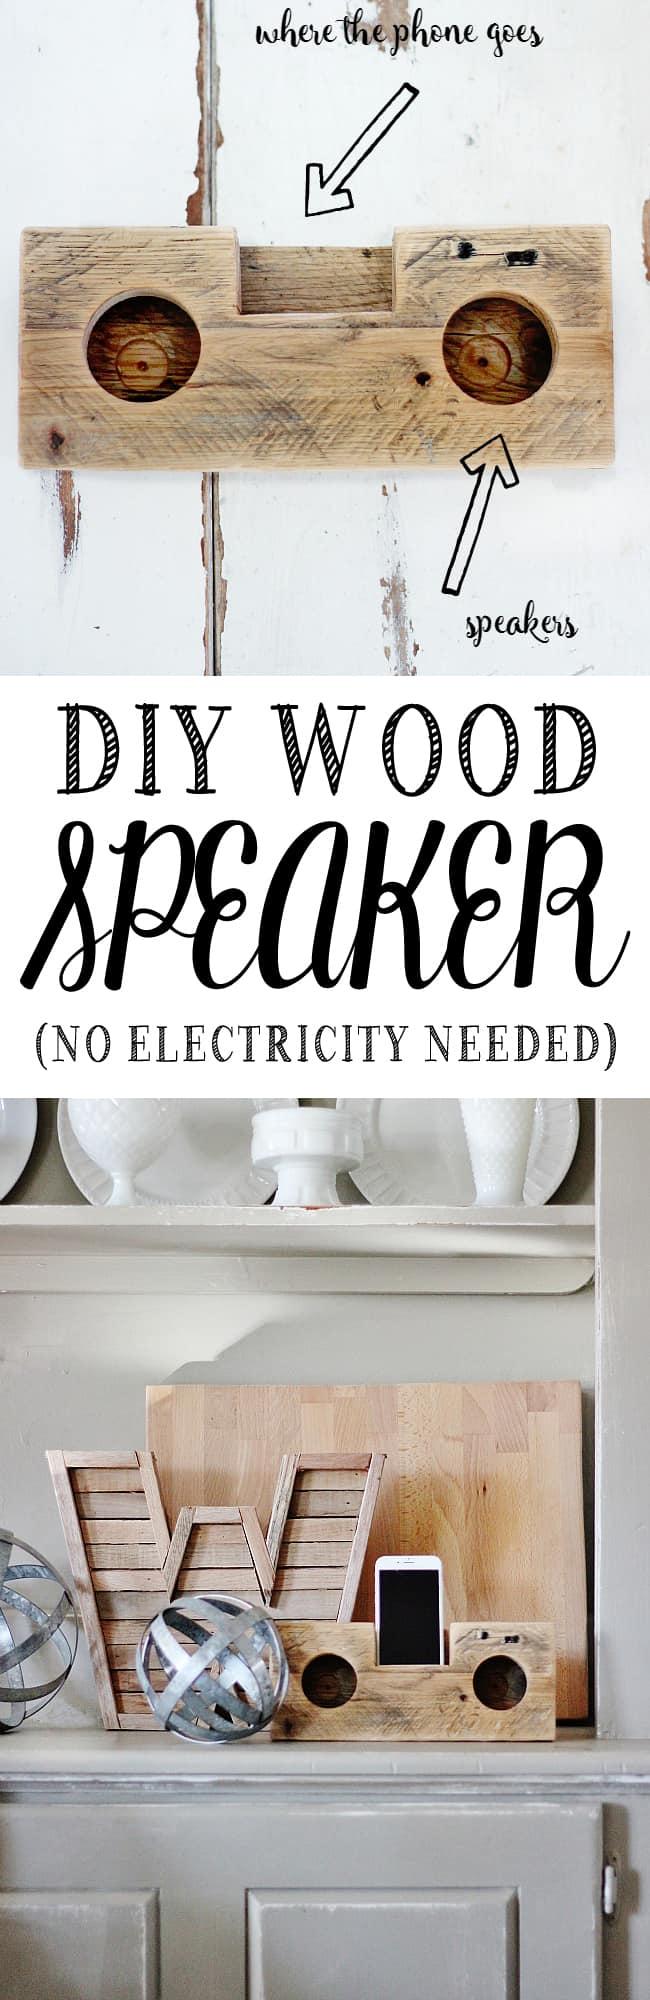 DIY Wood Speaker instructions